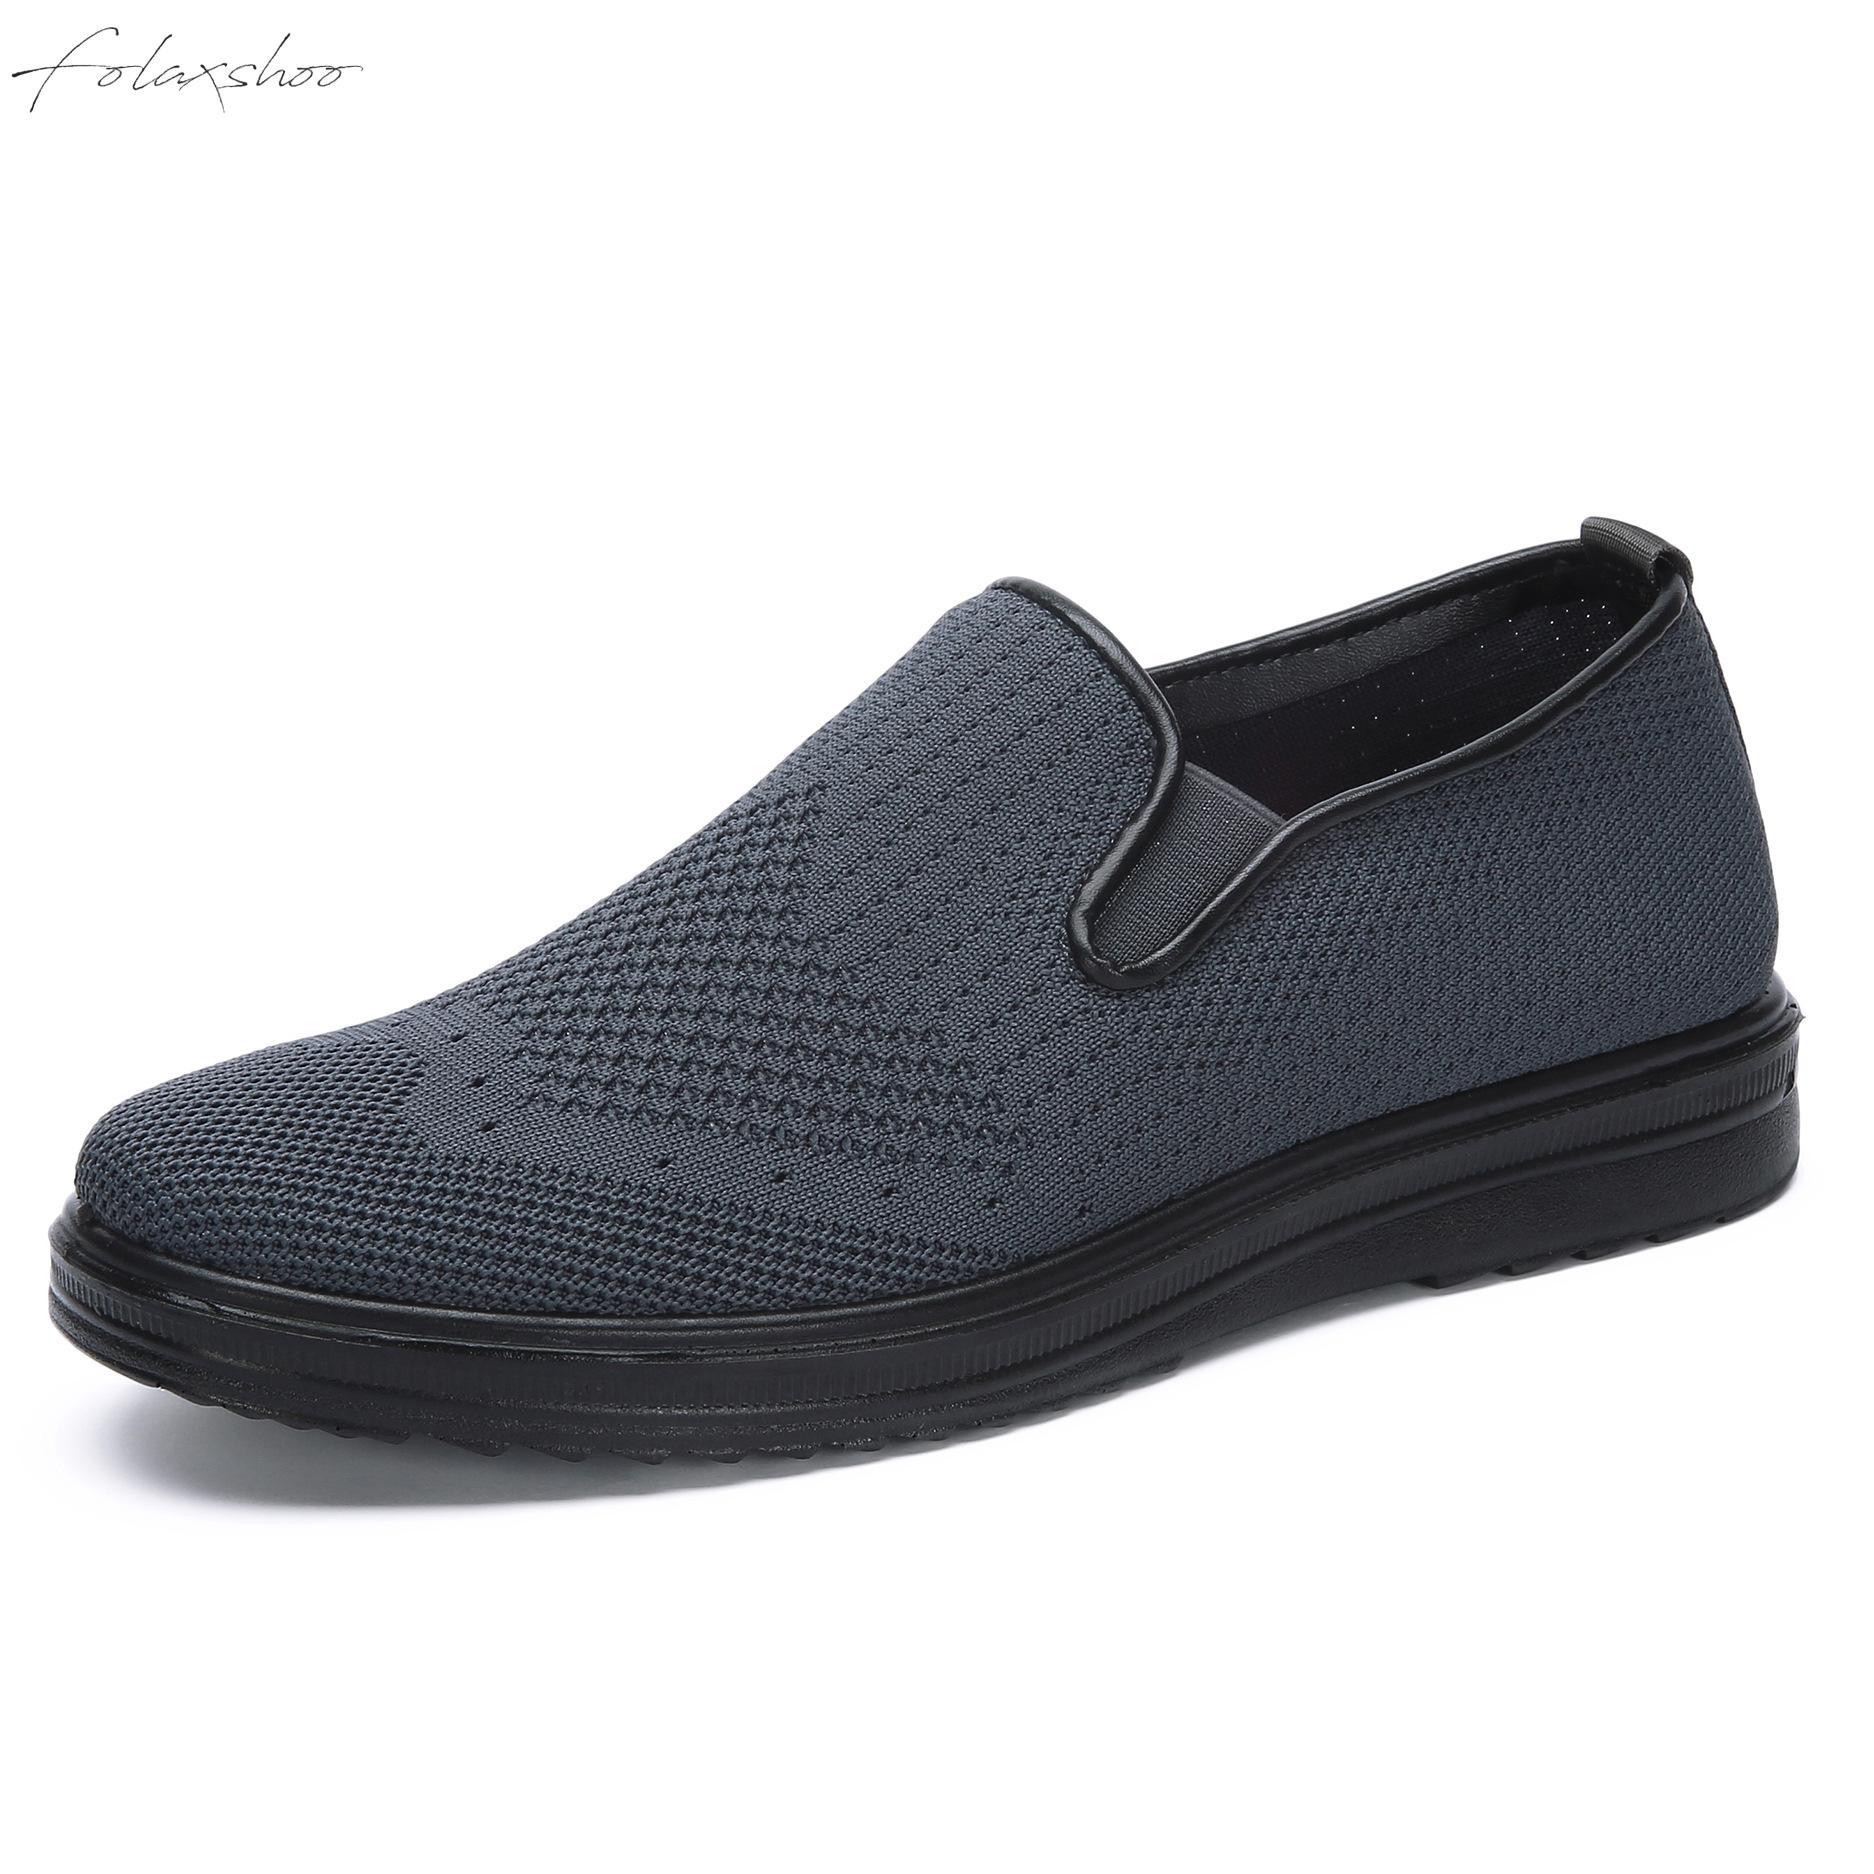 Folaxshoo Men's Casual Shoes Breathable Flats Footwear Walking Mesh Loafers Lightweight Slip-on Summer Men Soft Woven Moccasins